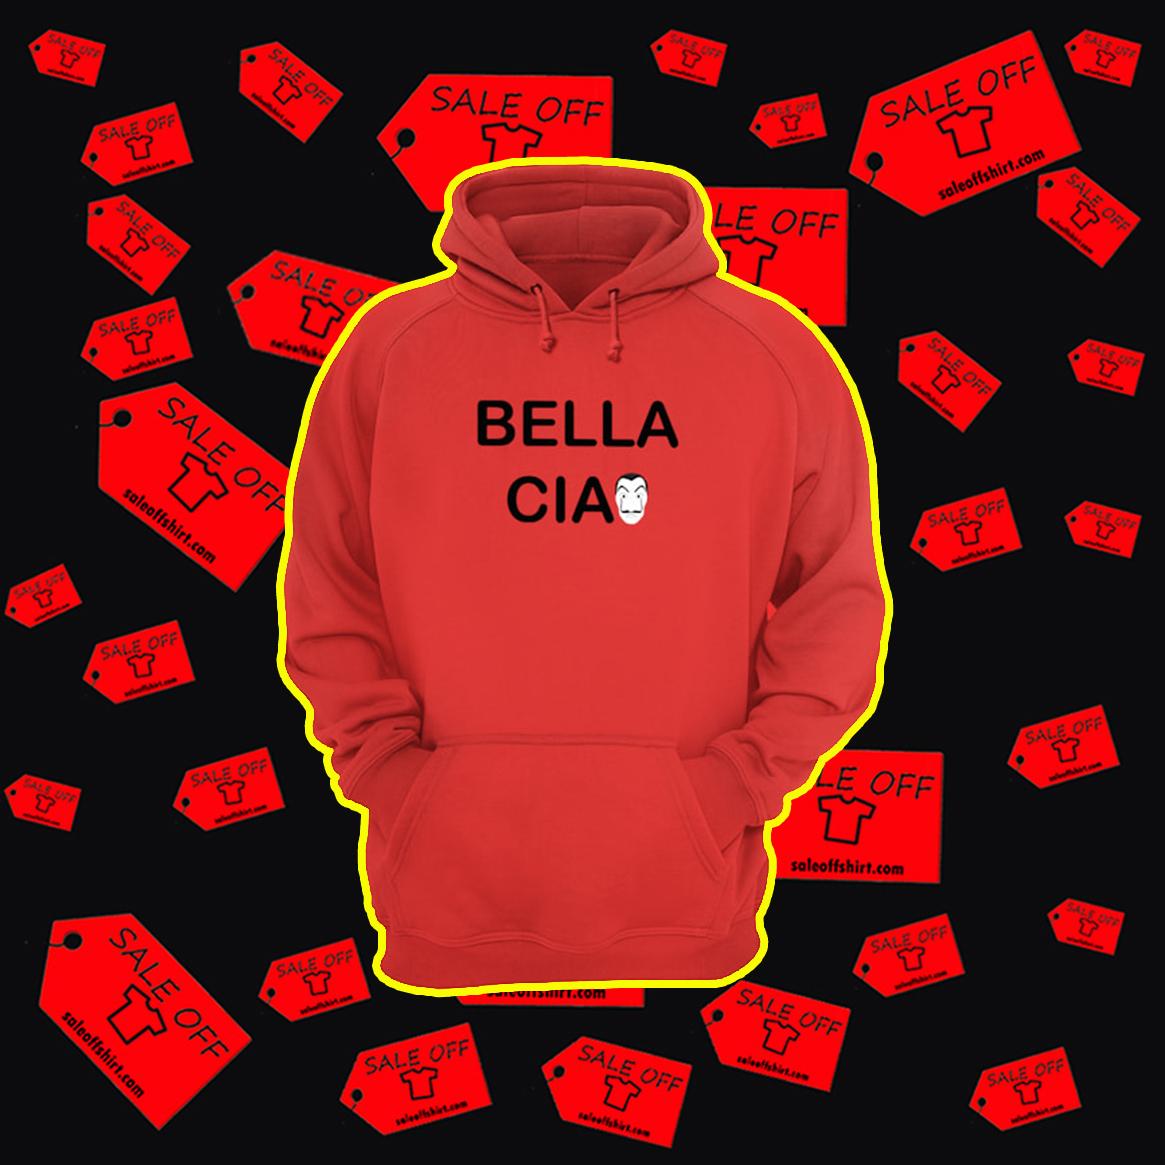 Bella Ciao hoodie